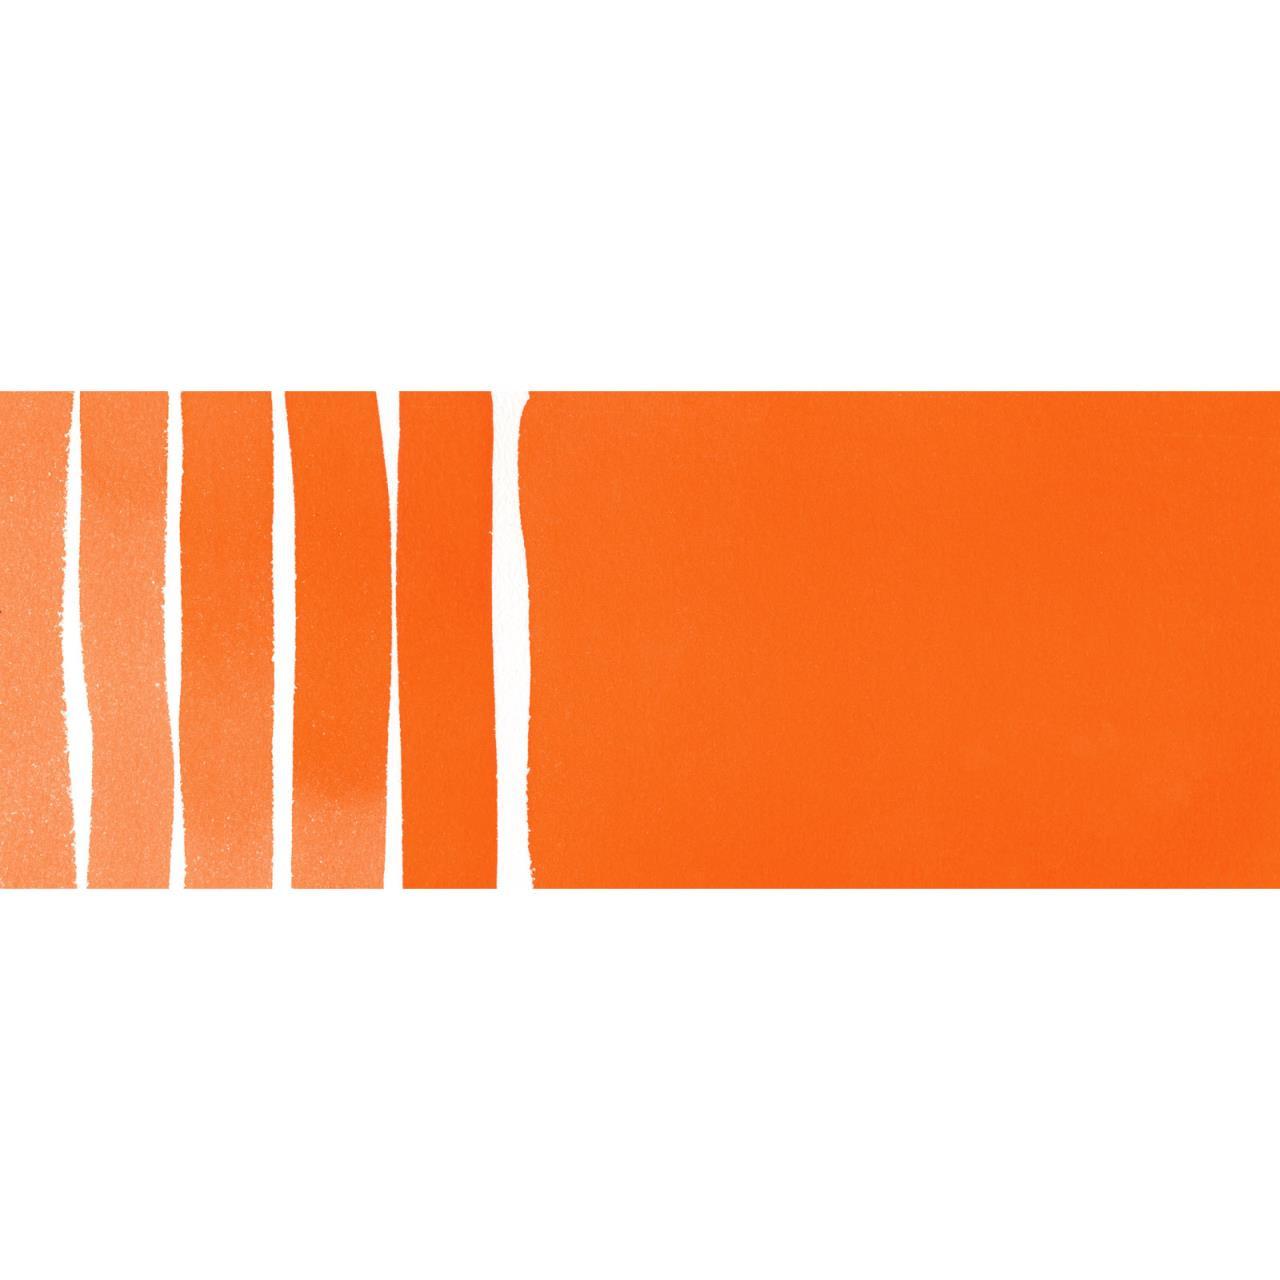 Pyrrol Orange, DANIEL SMITH Extra Fine Watercolors 5ml Tubes -